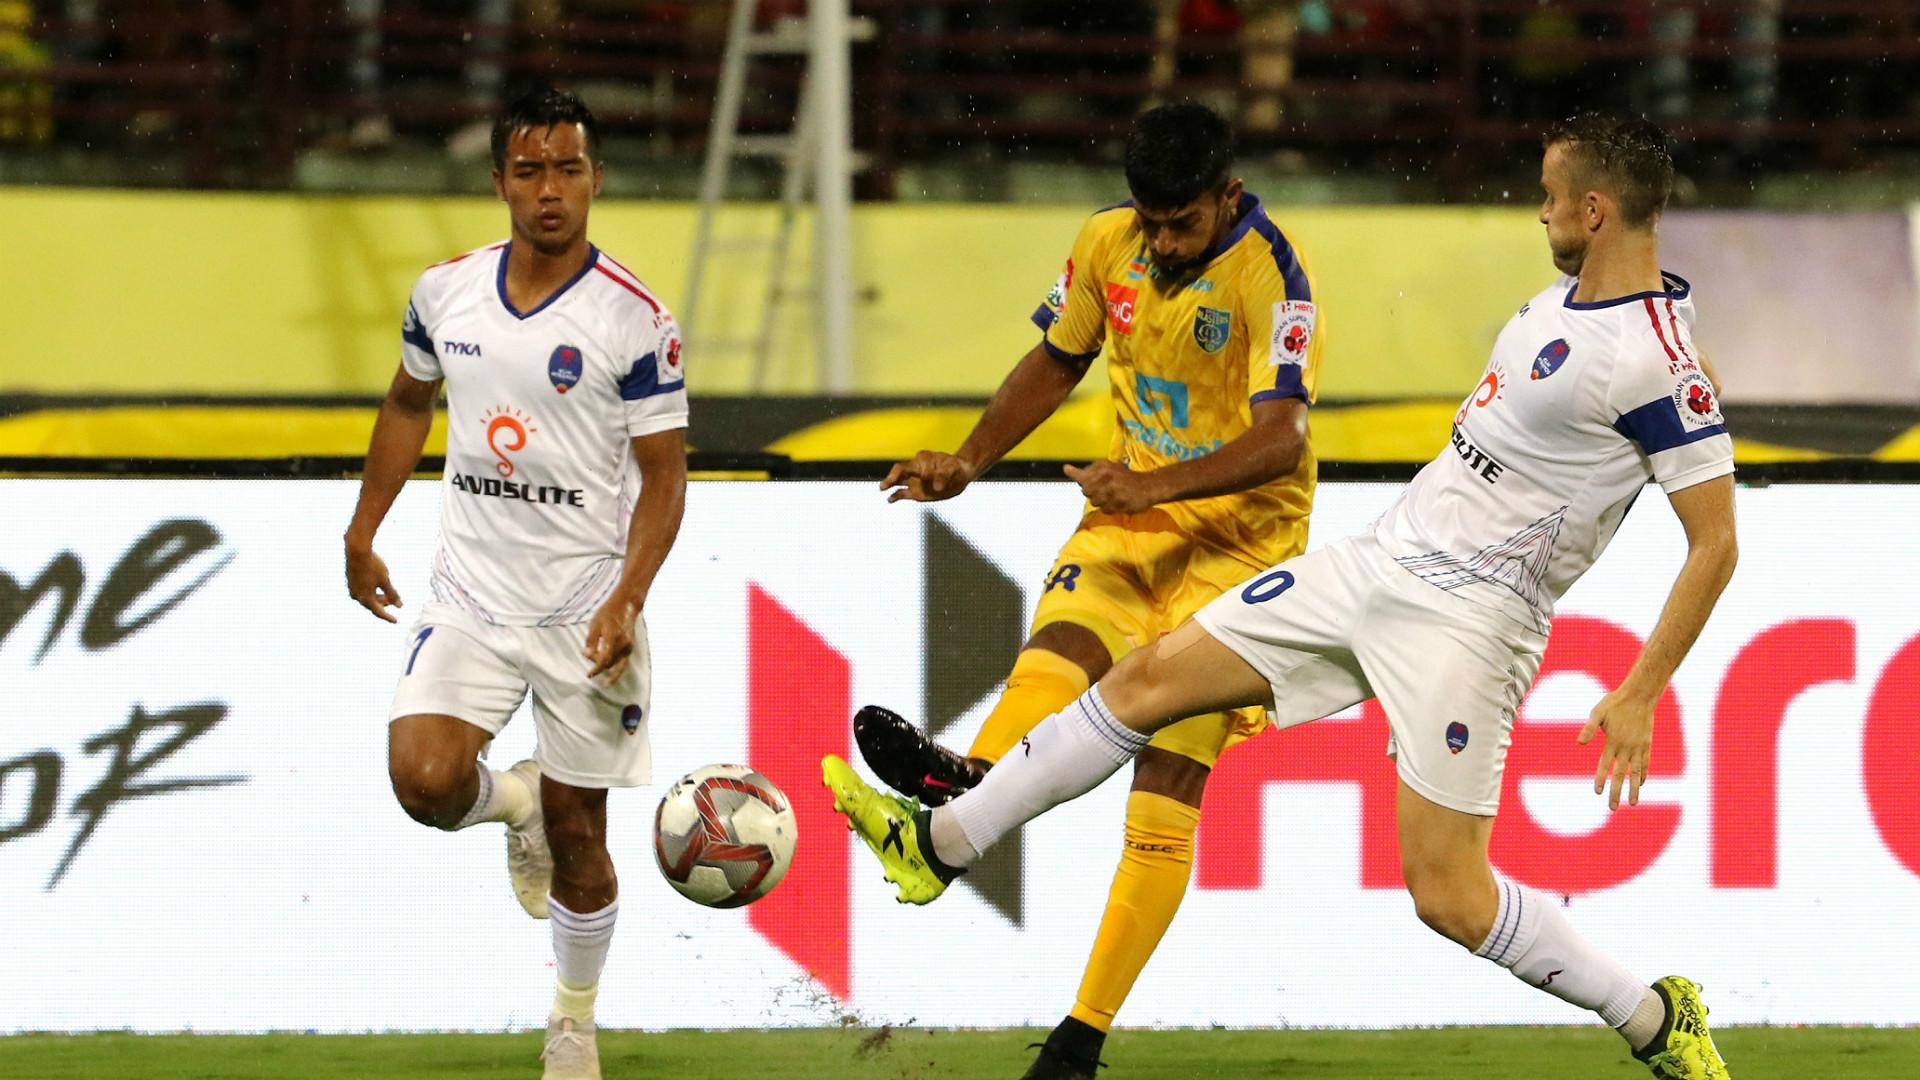 Kerala Blasters vs Delhi Dynamos ISL 2018-19